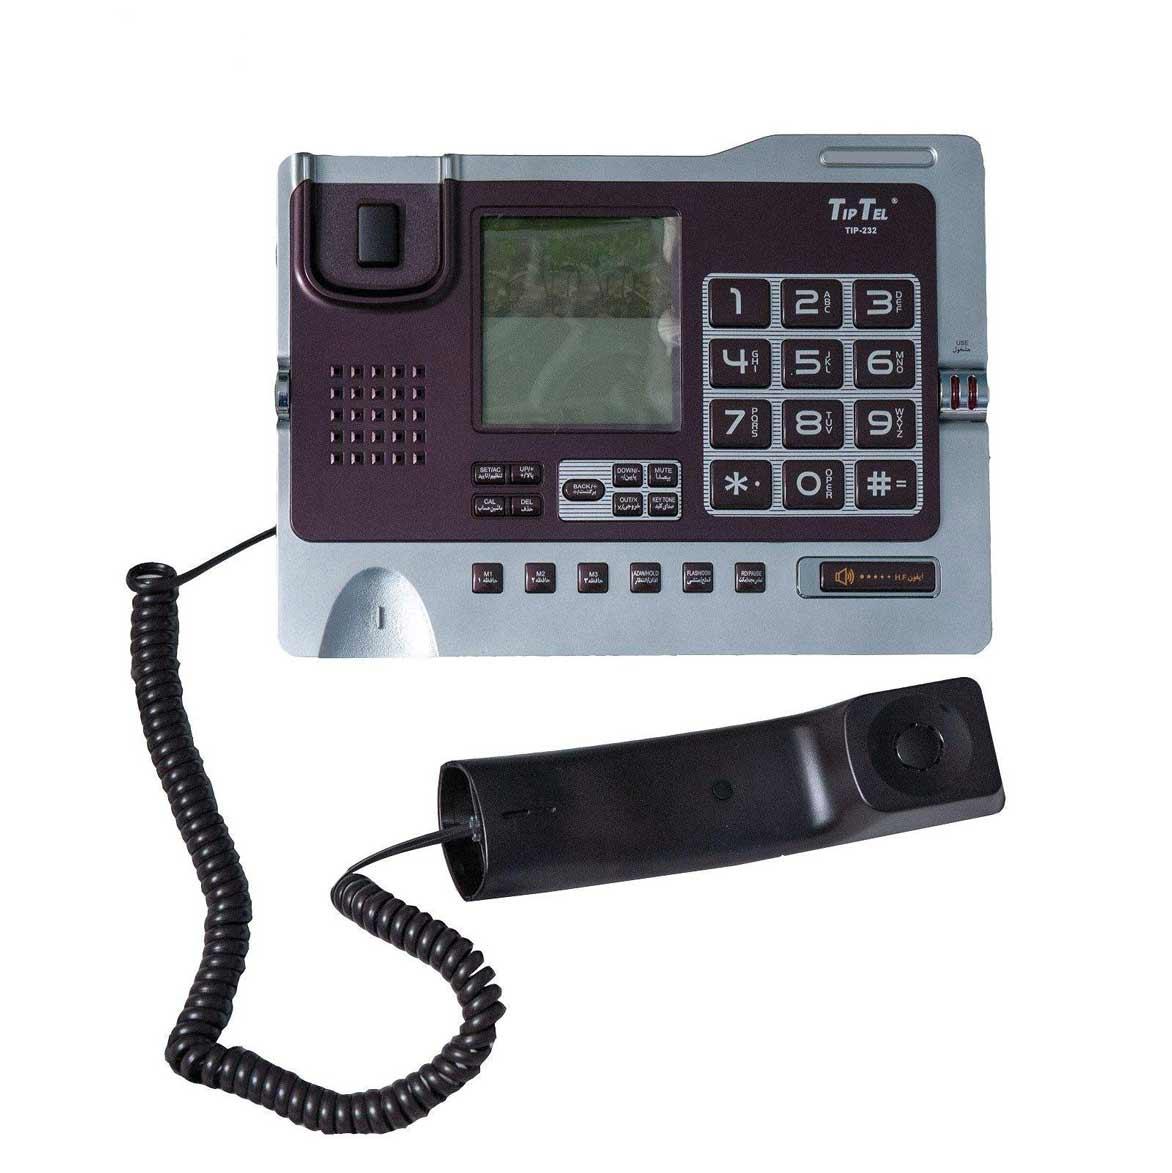 تلفن تیپ تل مدل TIP-232 رومیزی